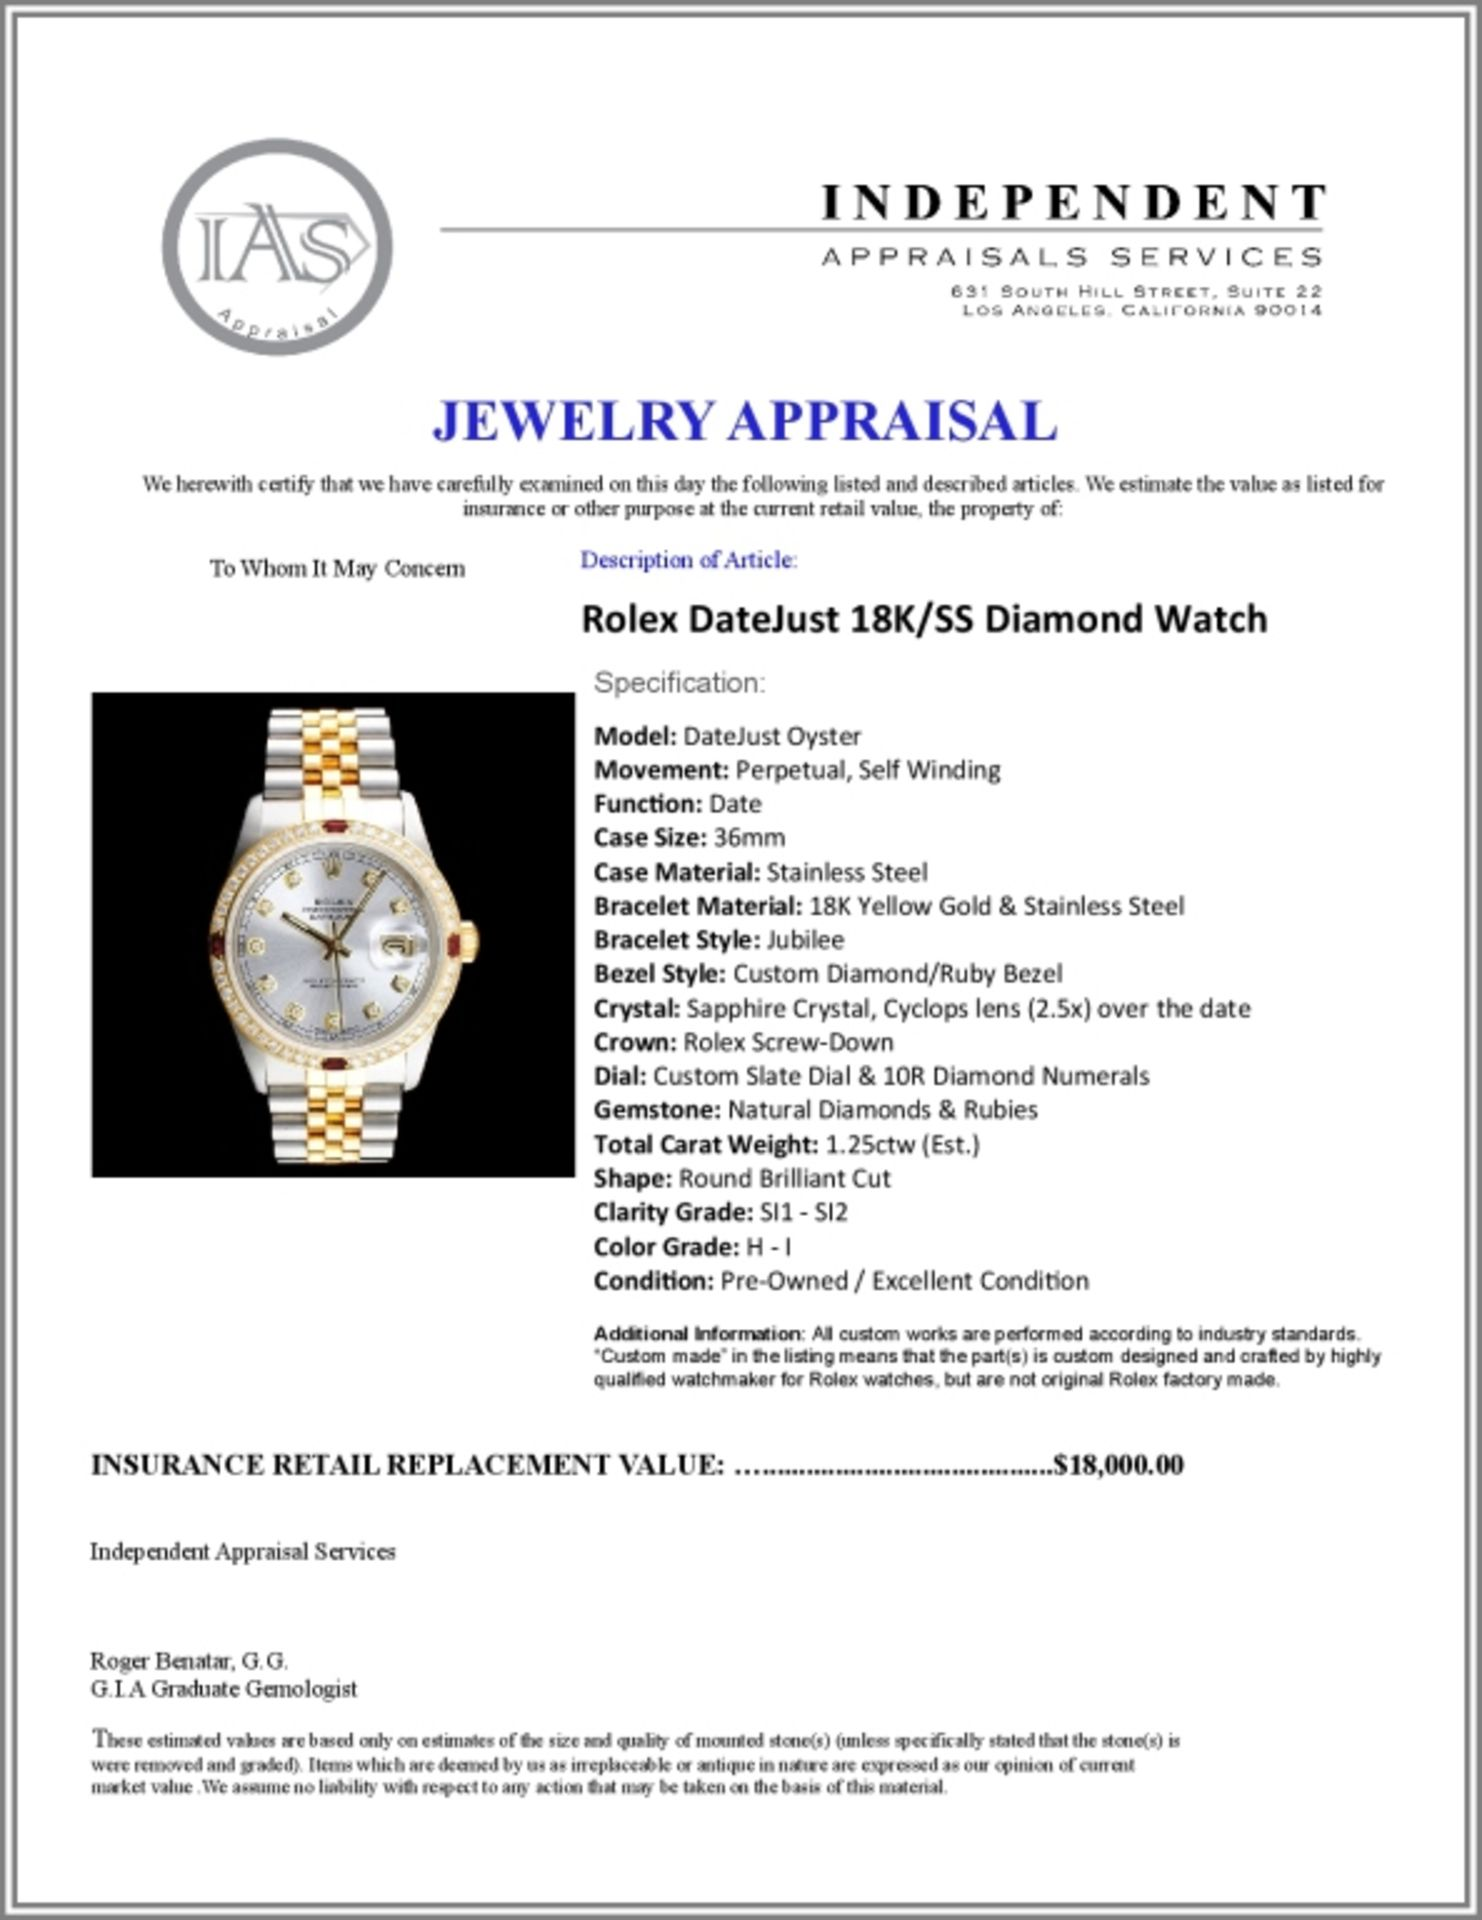 Rolex DateJust 18K/SS Diamond 36mm Watch - Image 6 of 6